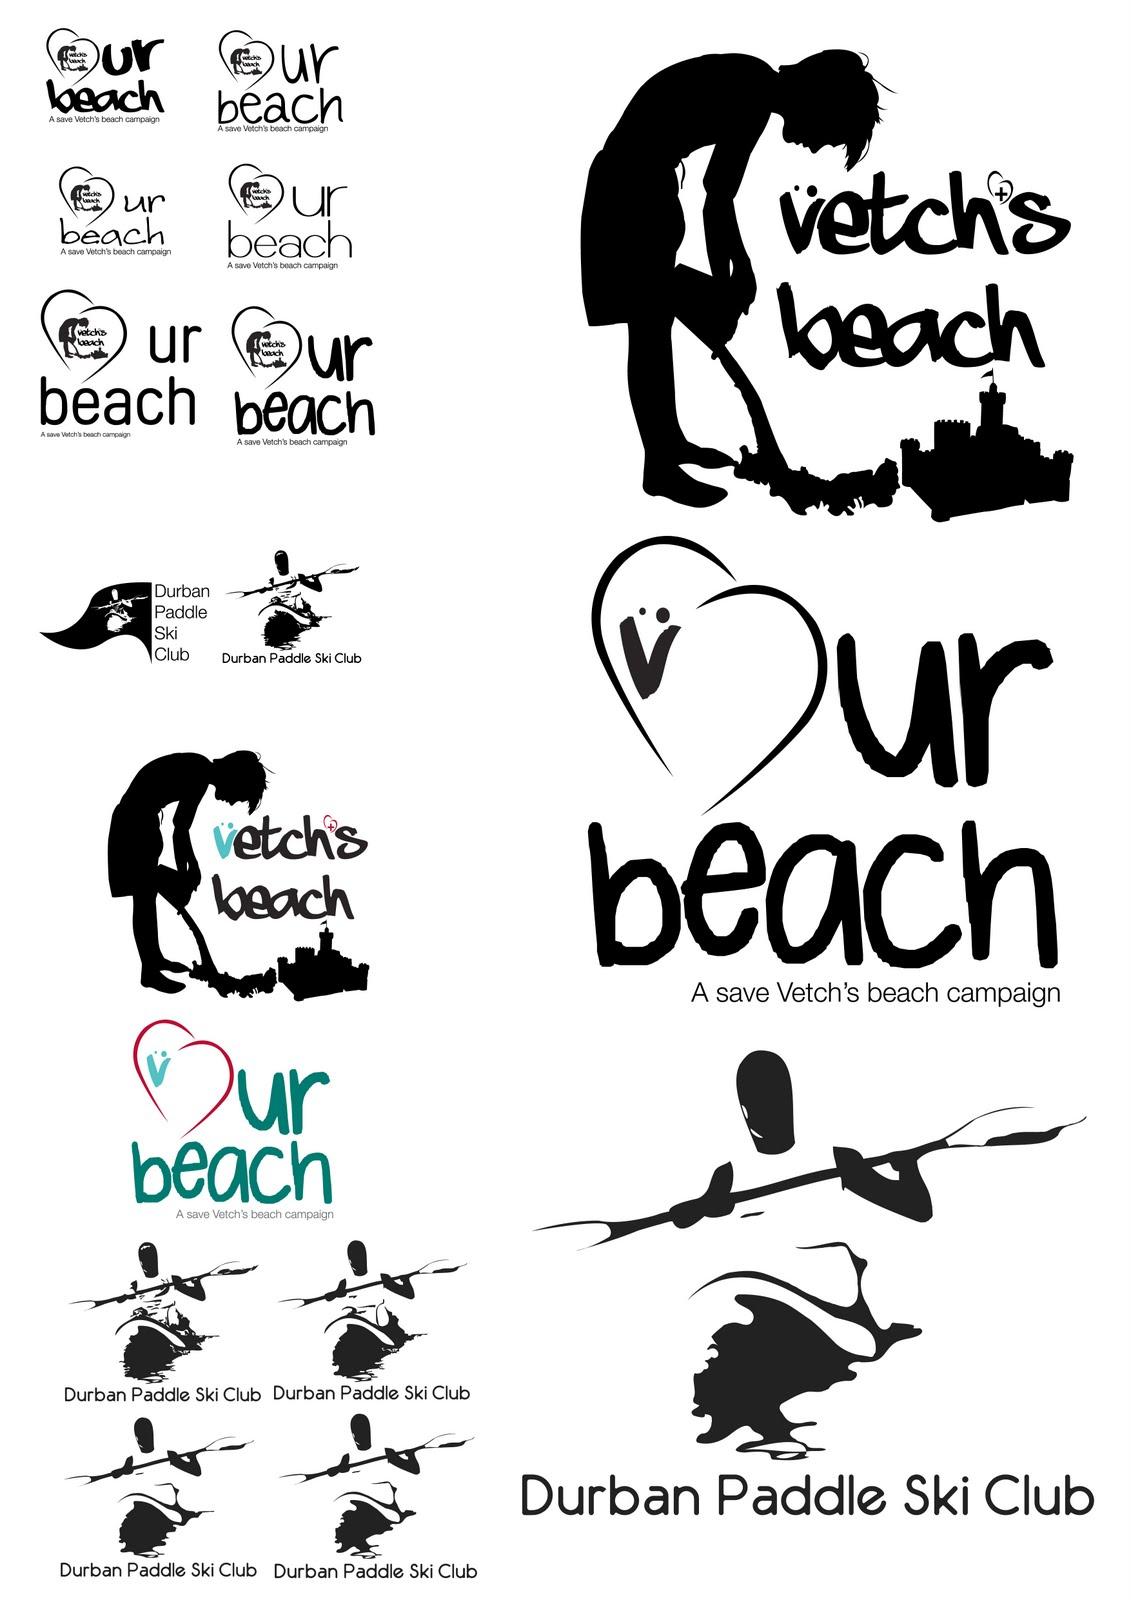 Thobani Gambushe: Corporate Identity, a Save Vetch's Beach